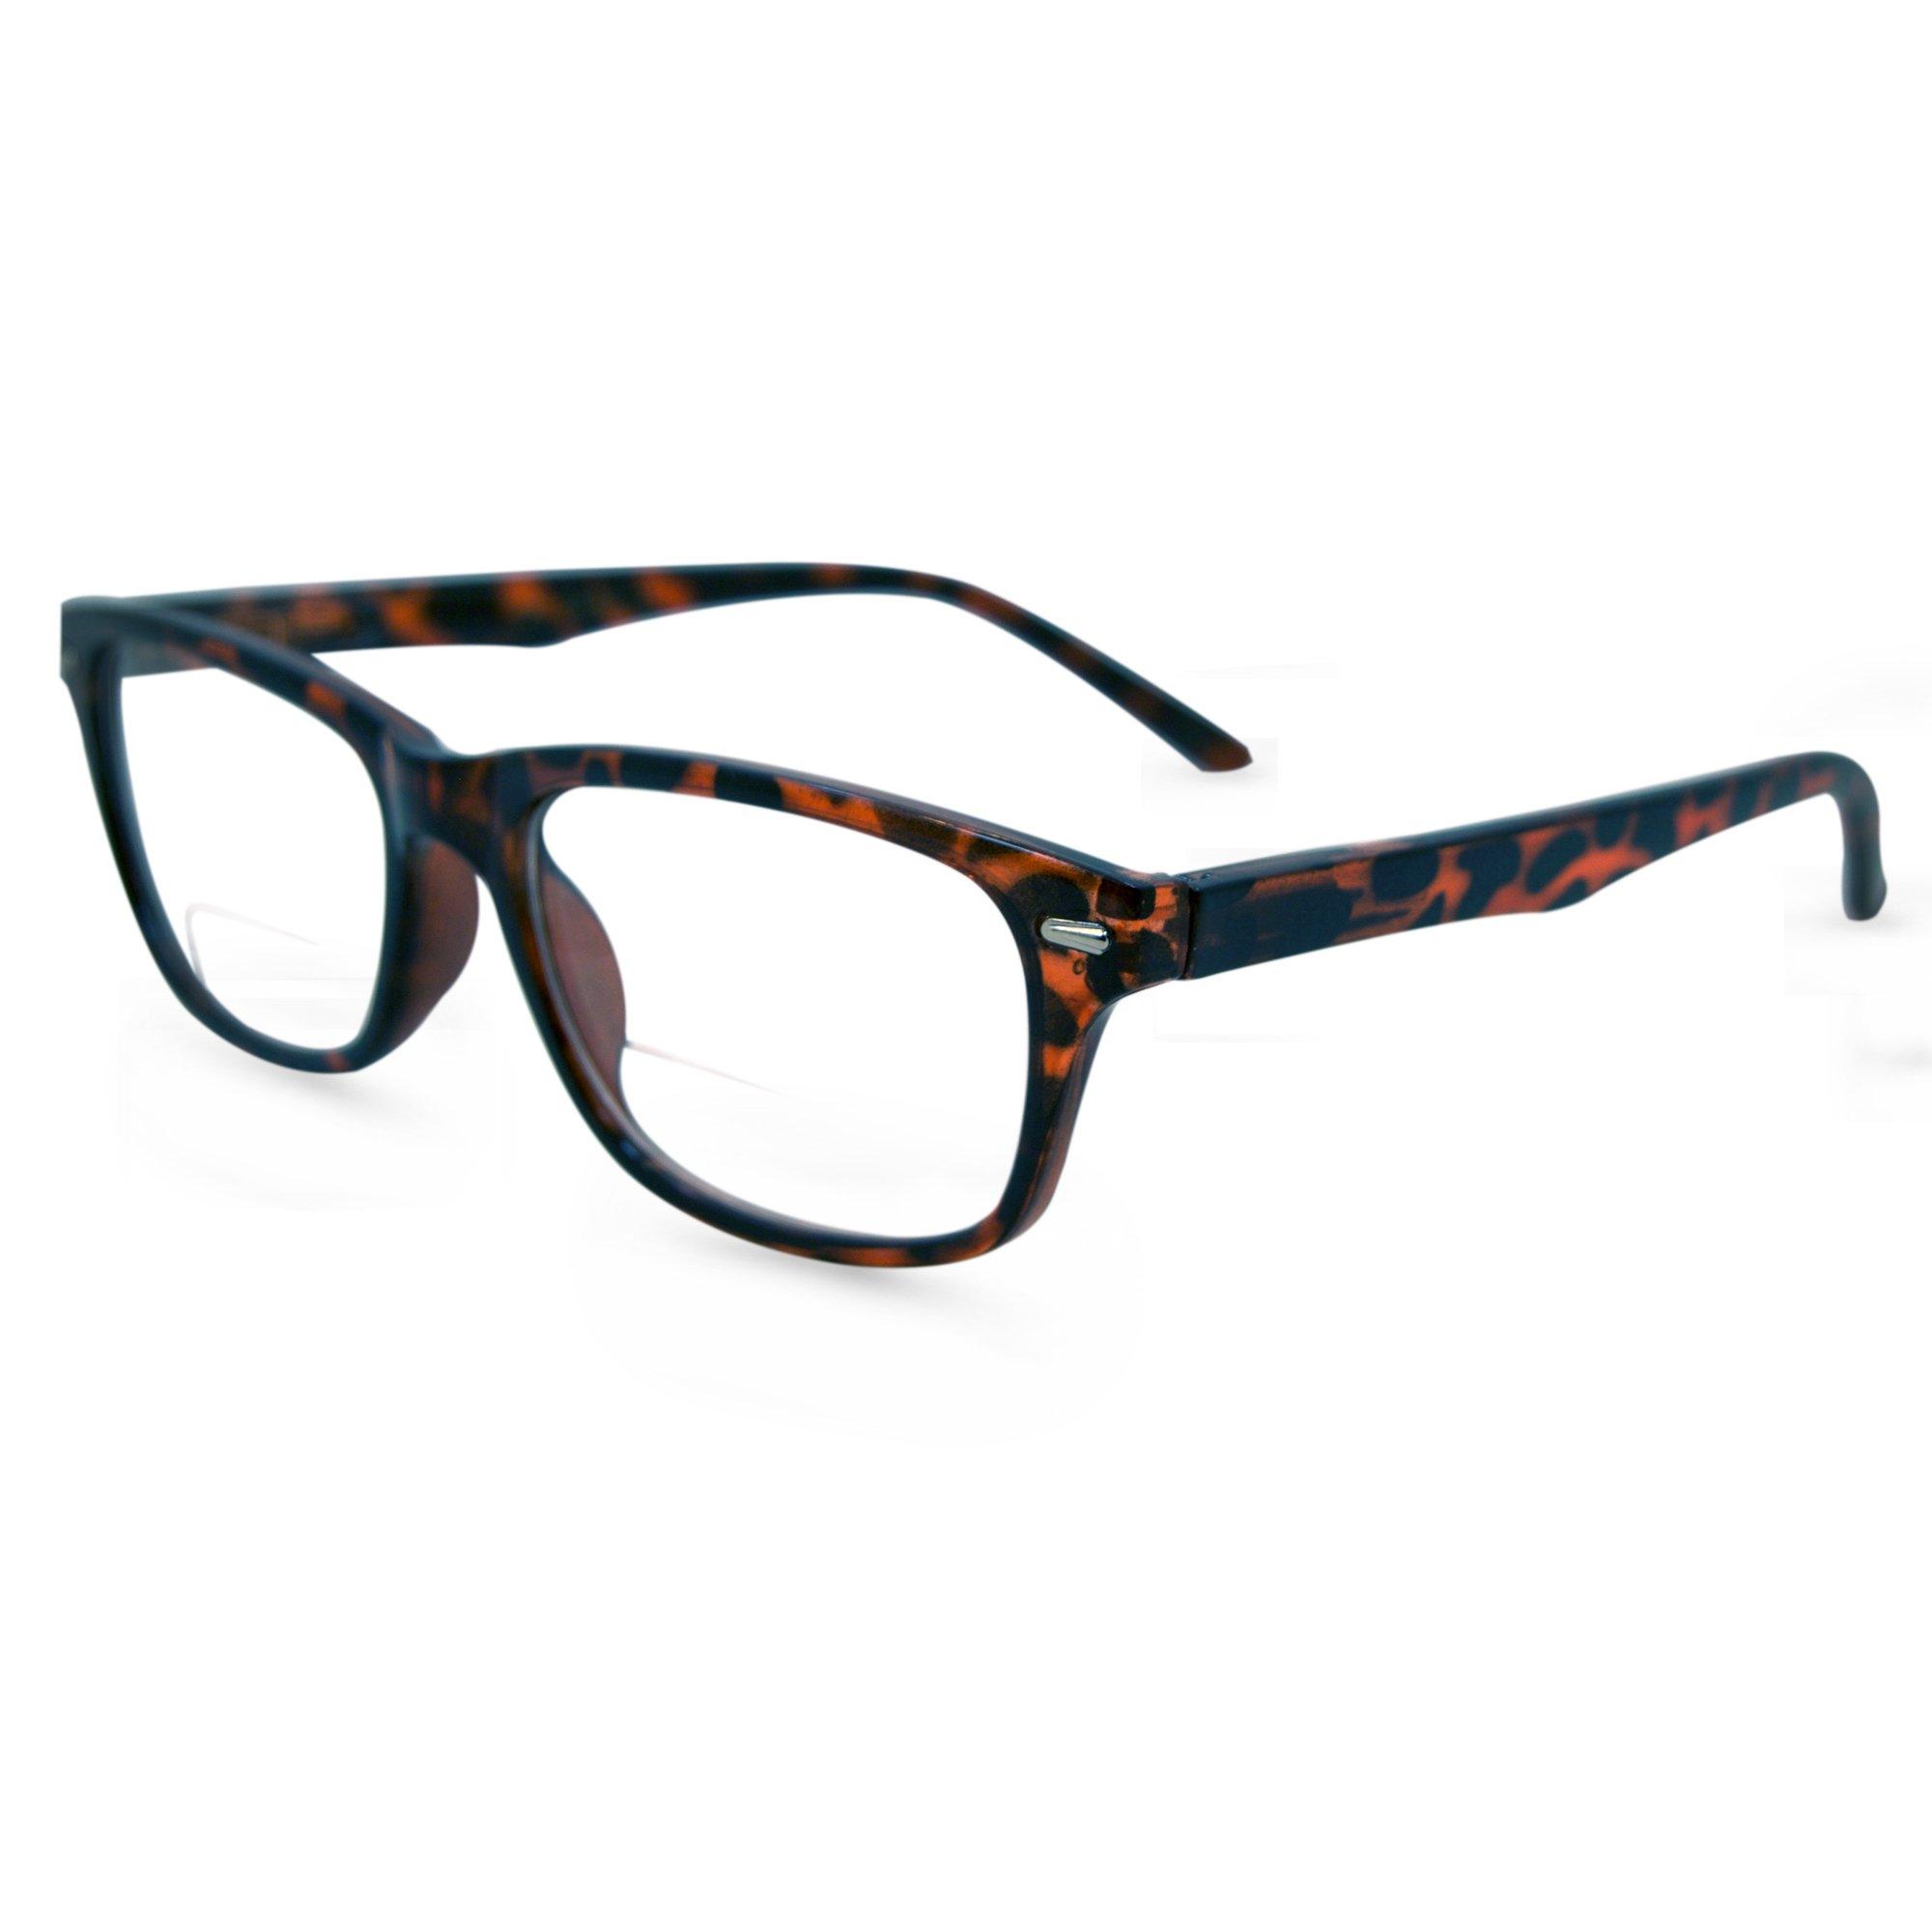 36d67d7c8e8 Galleon - In Style Eyes Seymore Retro BiFocal Reading Glasses Tortoise 3.50